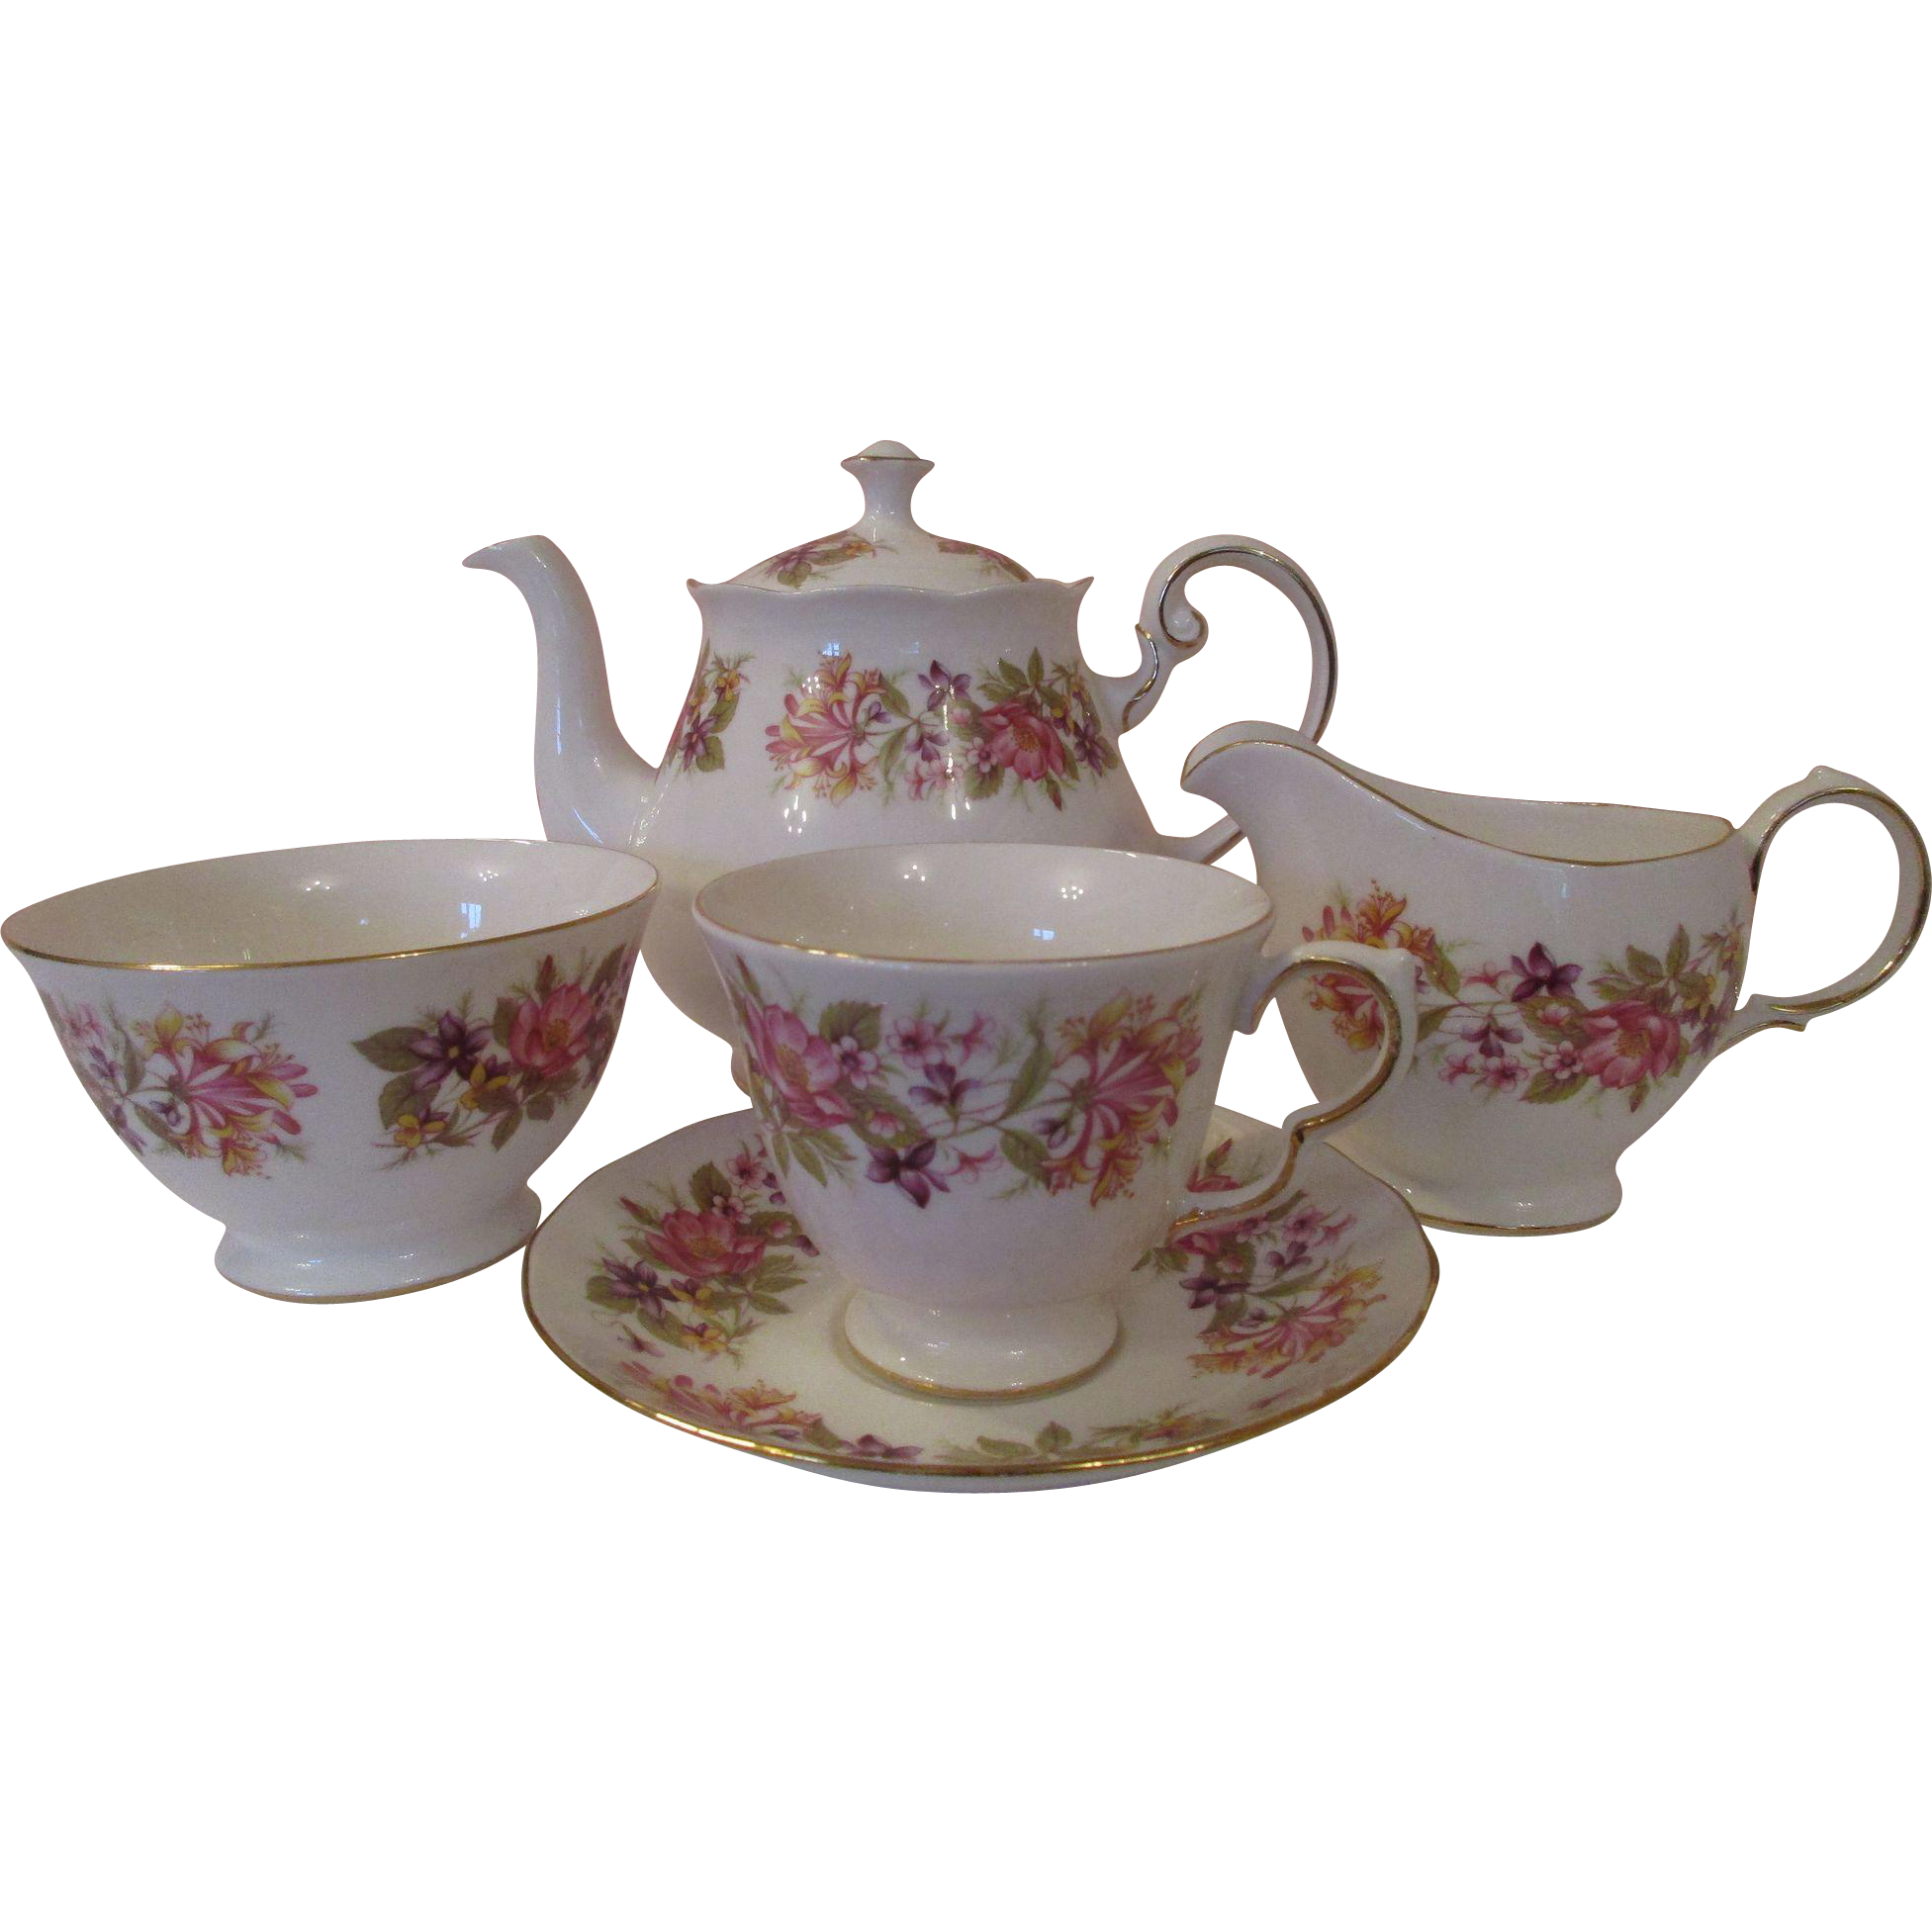 Full English Colclough Bone China Tea Set 34 Pieces Bone China Tea Set Tea Sets Vintage Bone China Tea